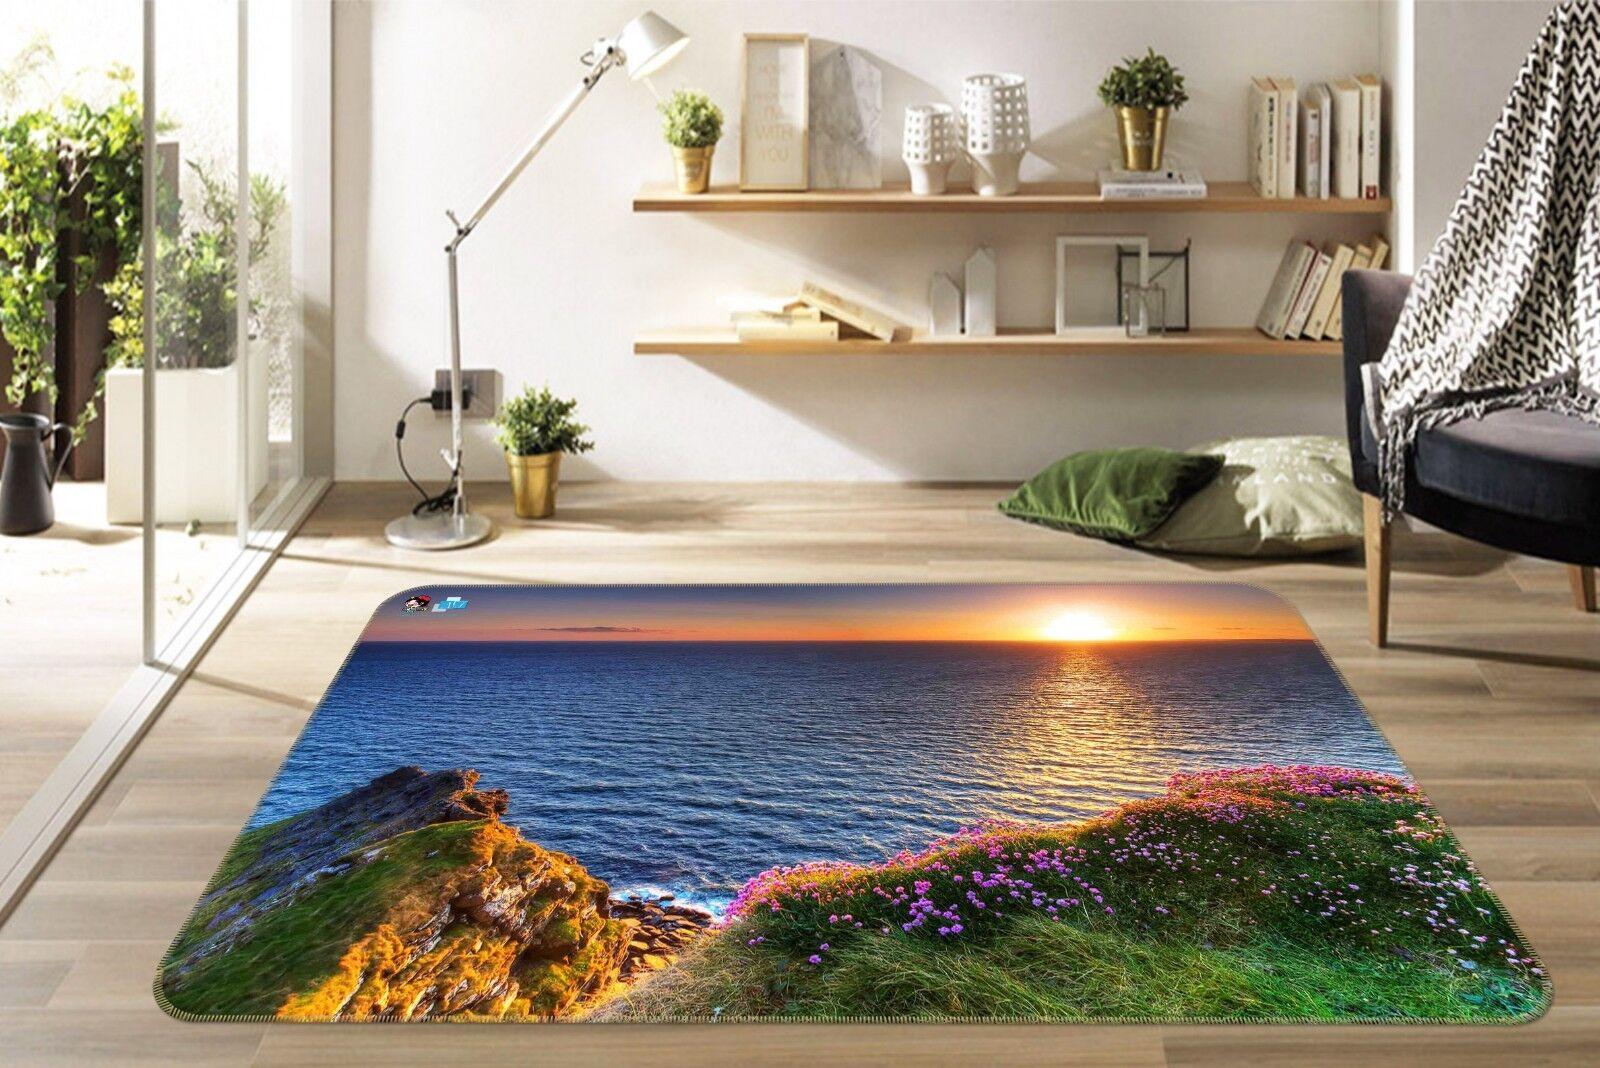 3d anochecer río 022 non-slip Carpet mat quality elegante Carpet de Summer